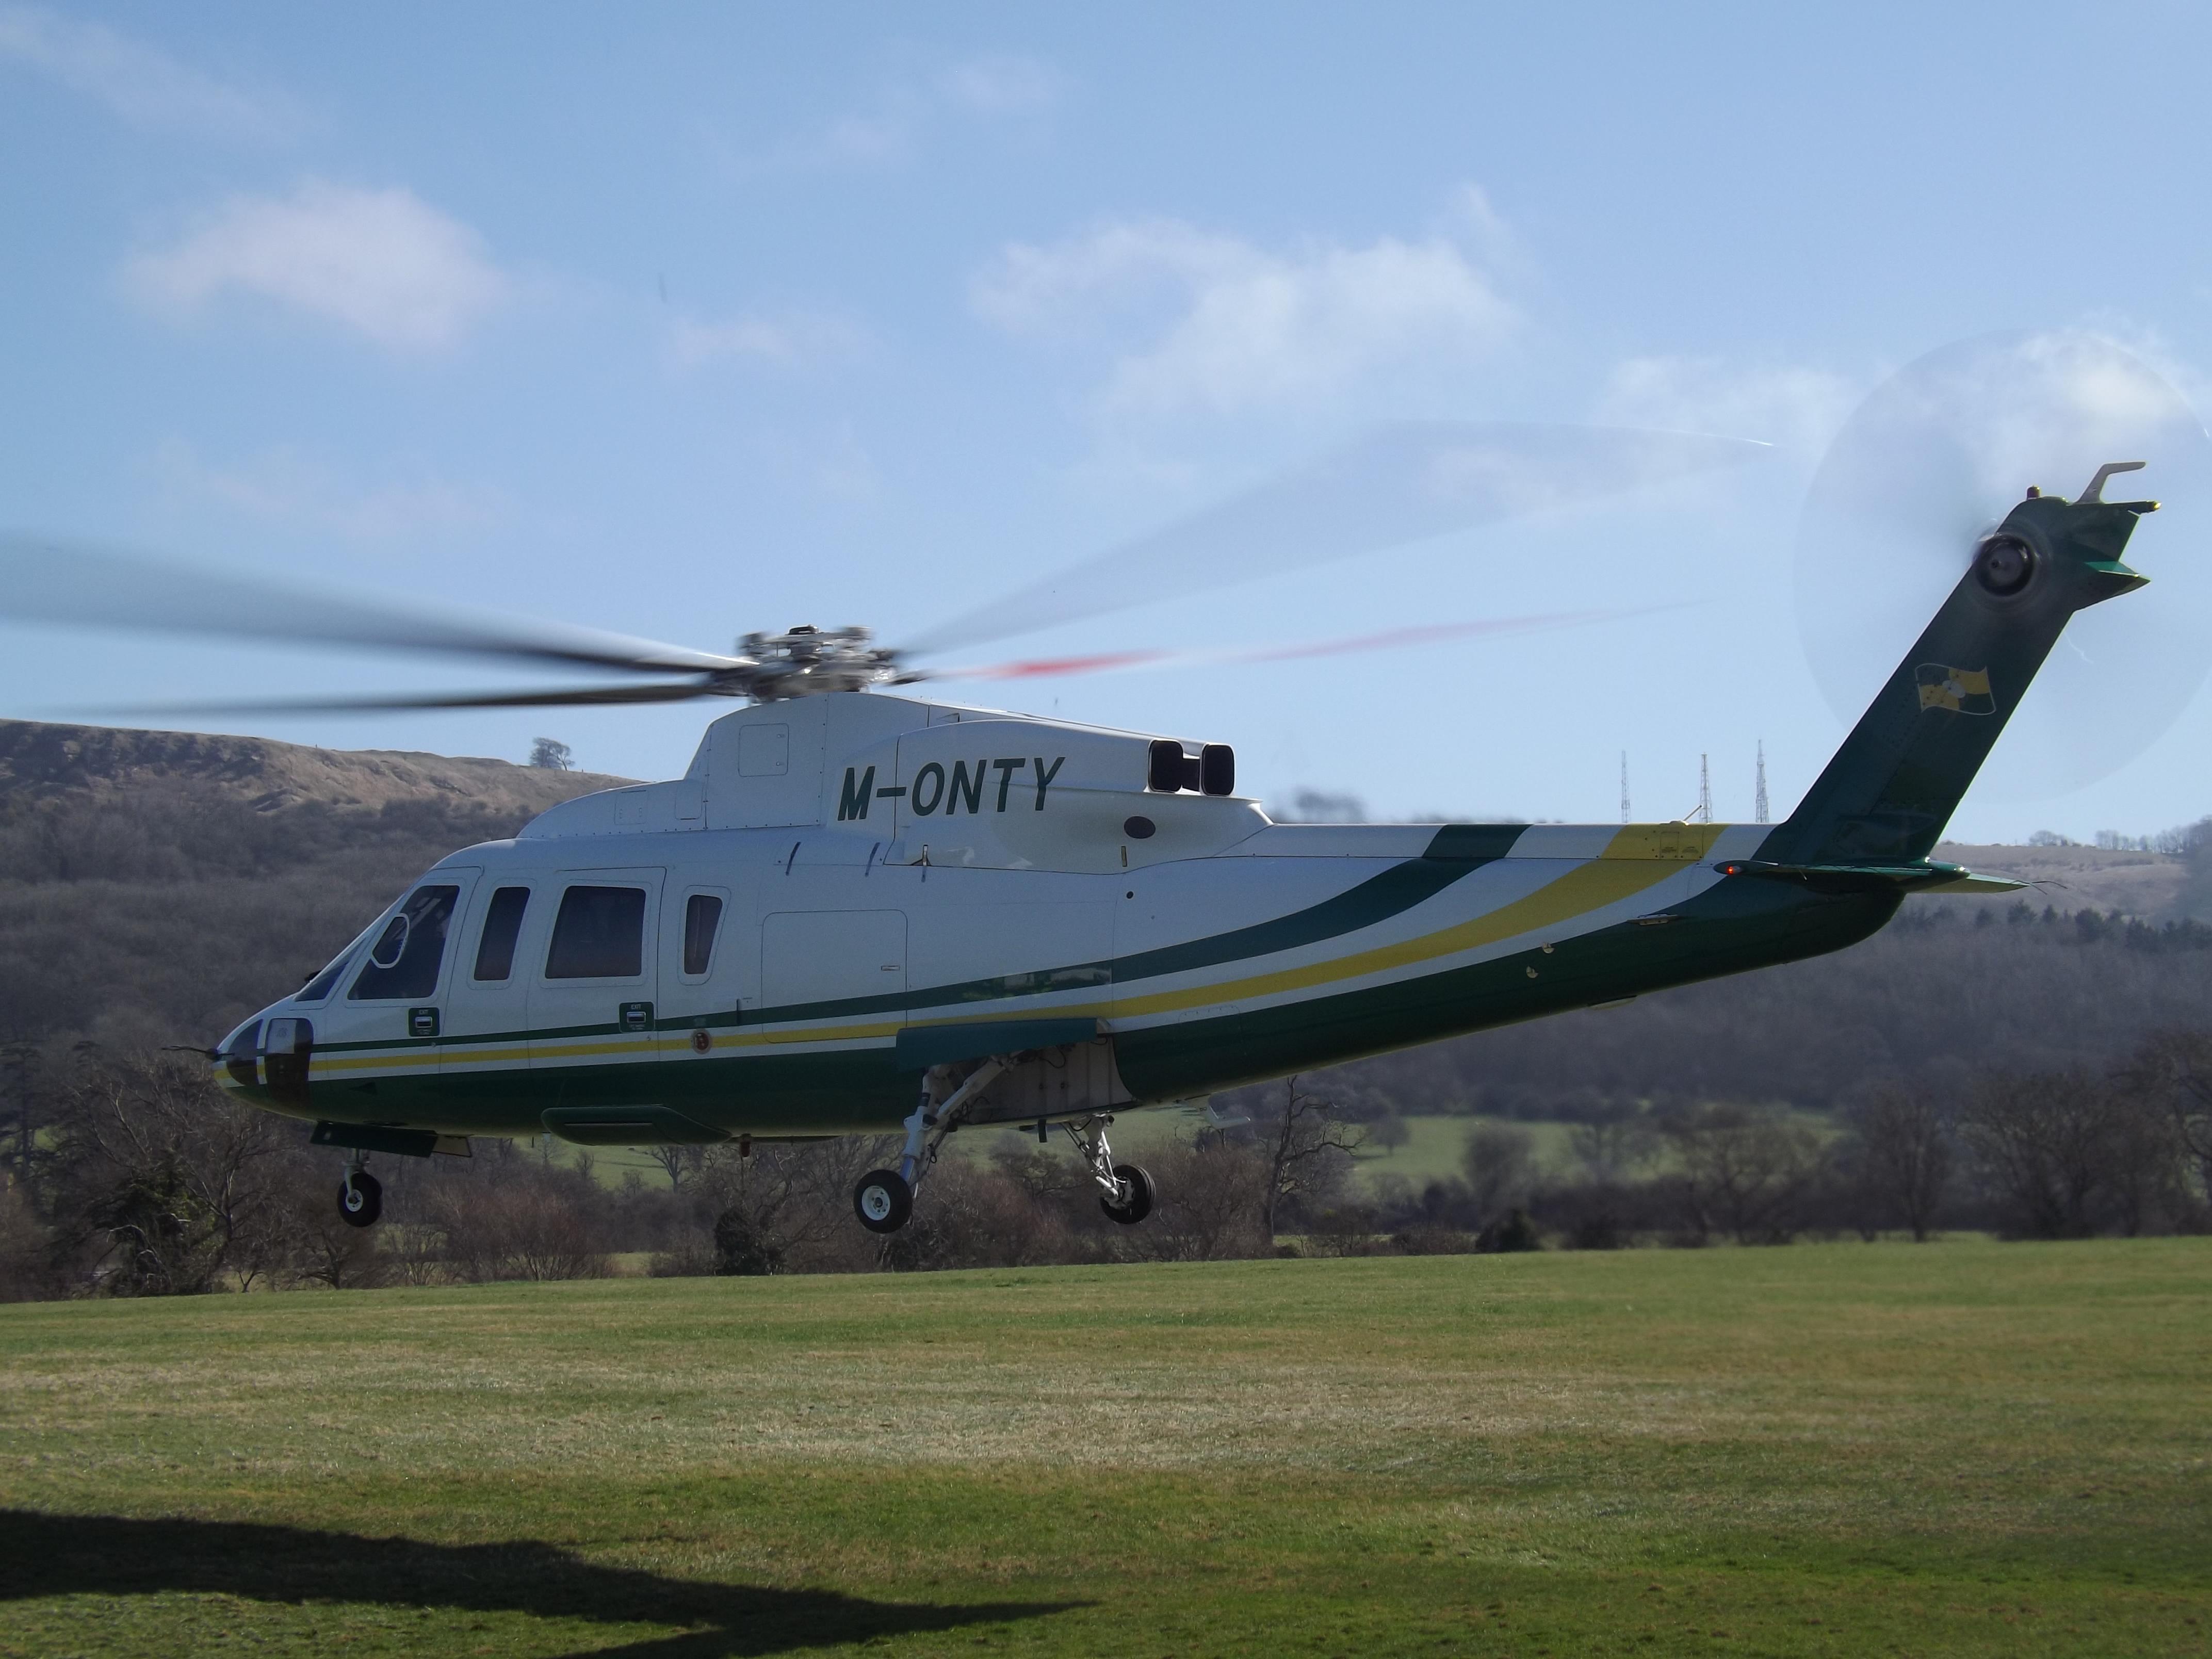 File:M-ONTY Sikorsky S-76B Helicopter Trustair Ltd.jpg - Wikimedia Commons